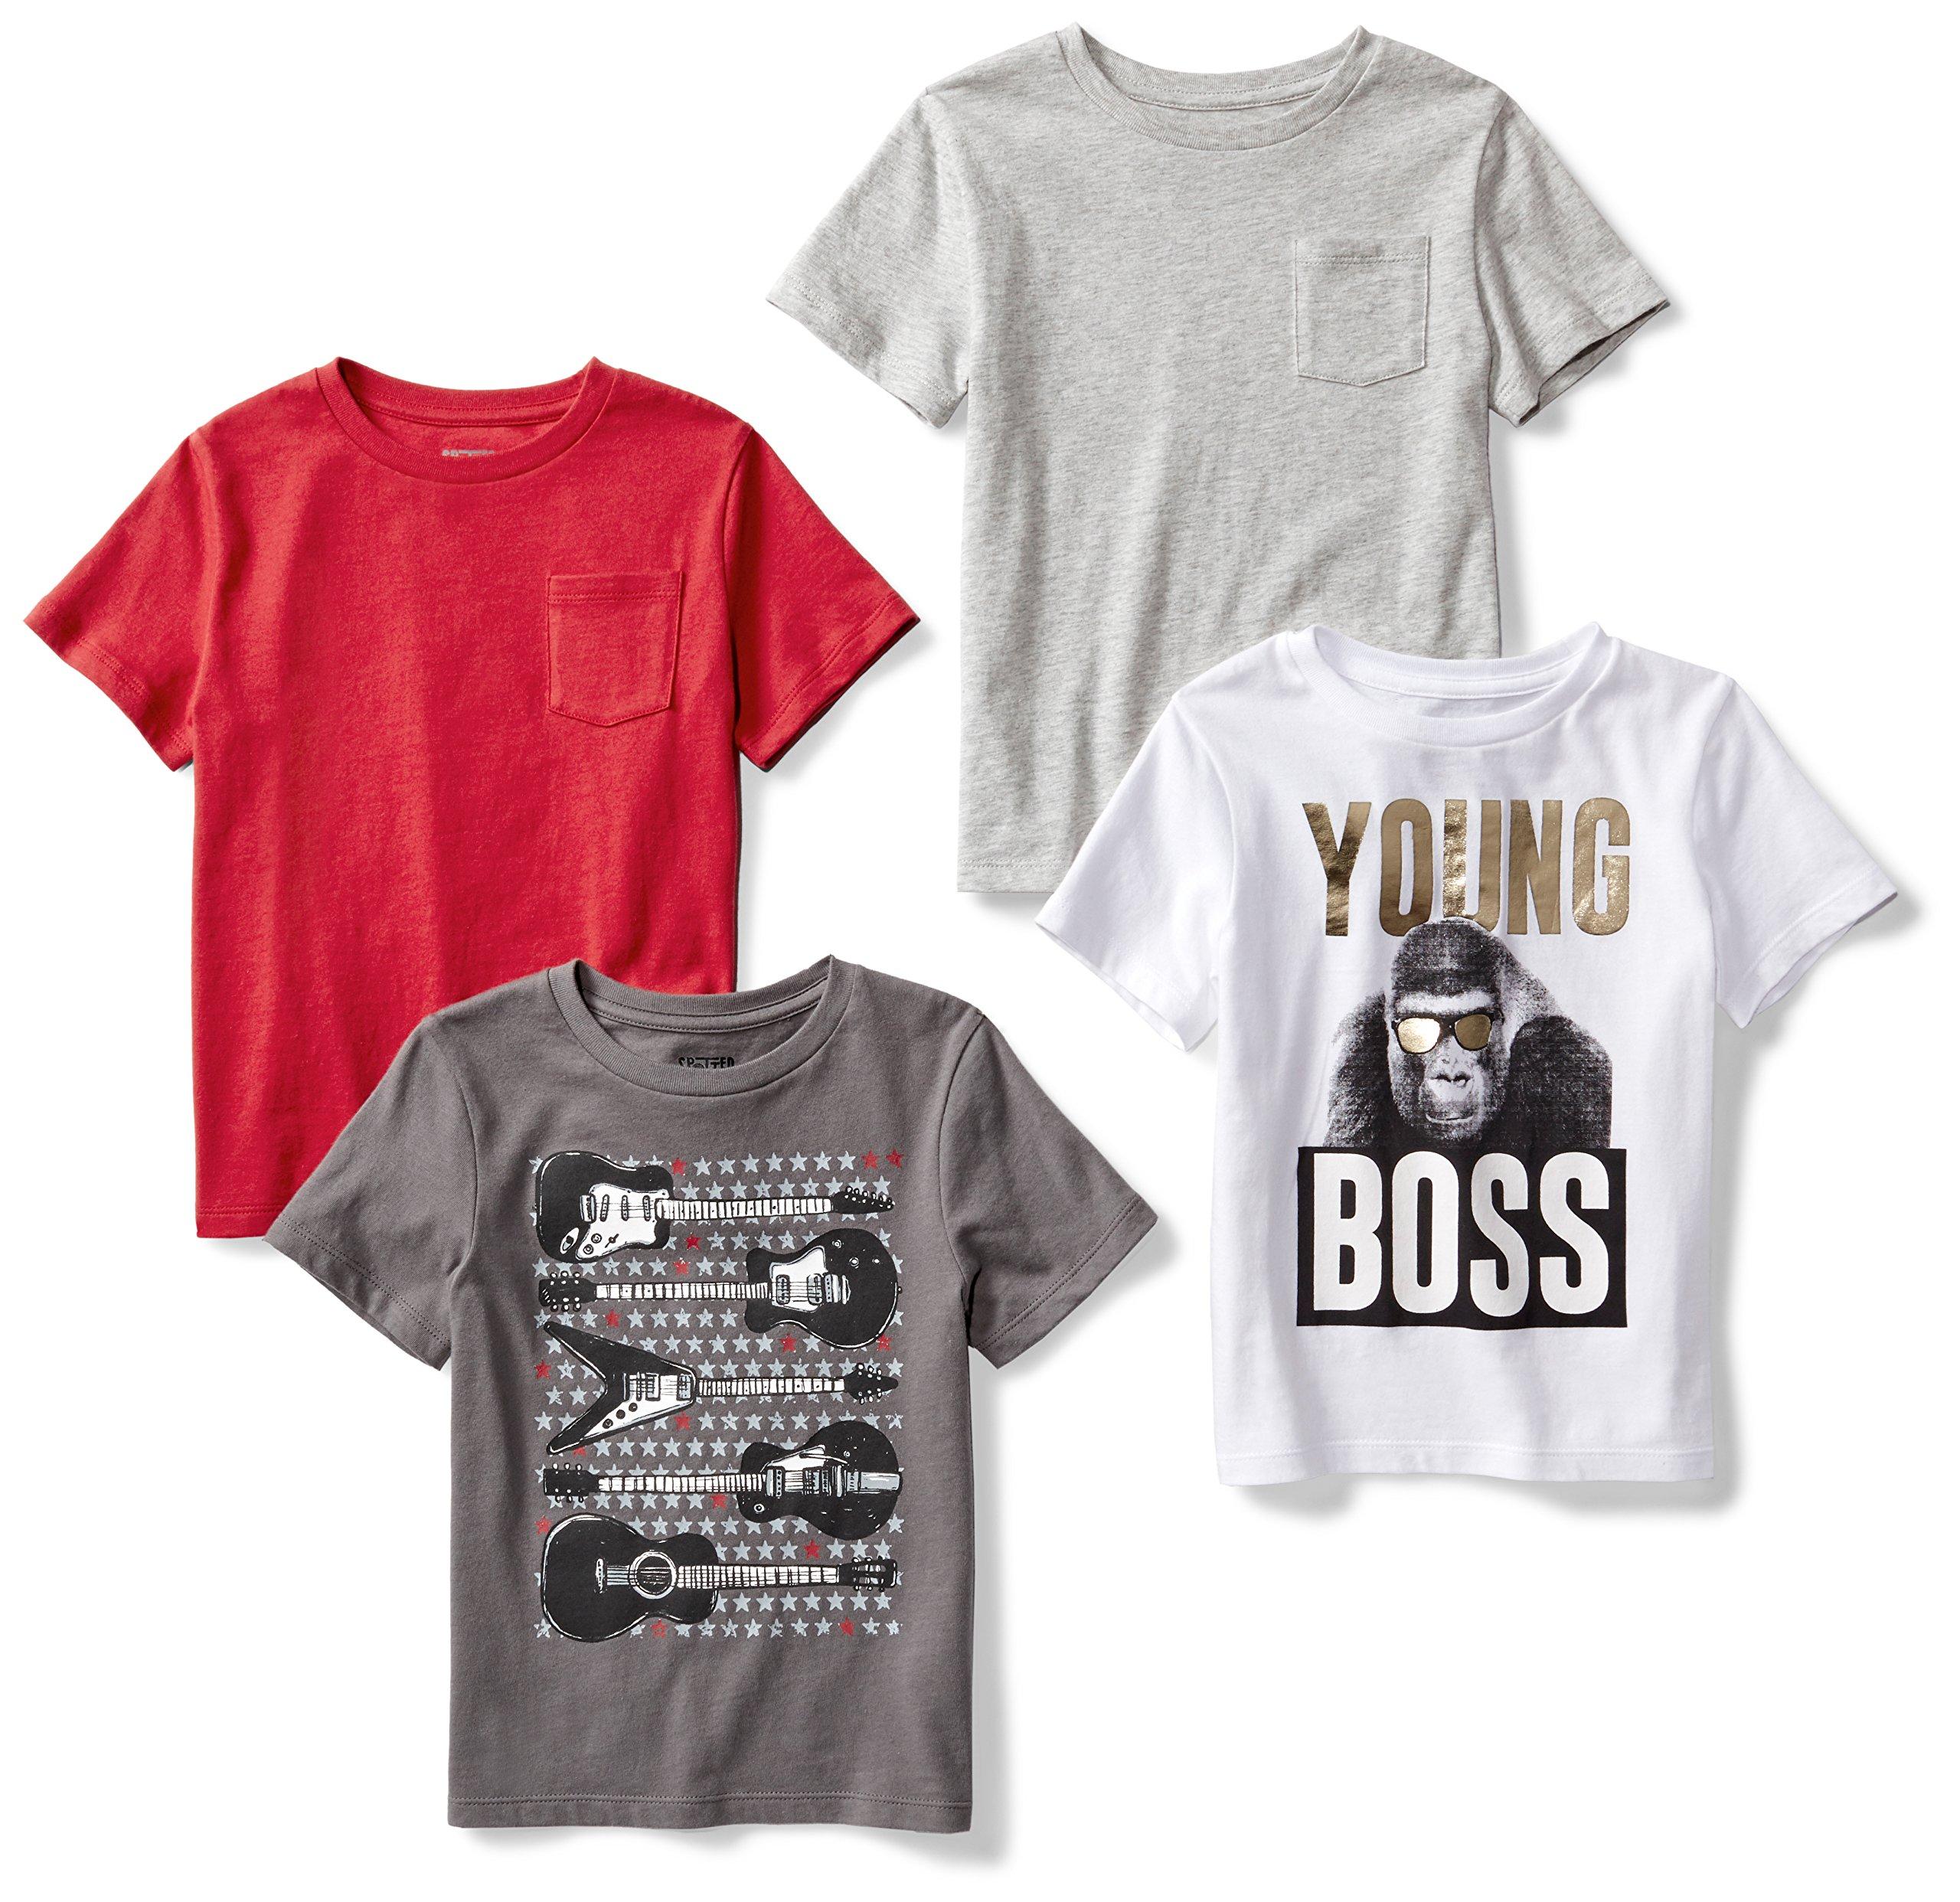 Amazon Brand - Spotted Zebra Boys' Big Kid 4-Pack Short-Sleeve T-Shirts, Young Boss, Medium (8)